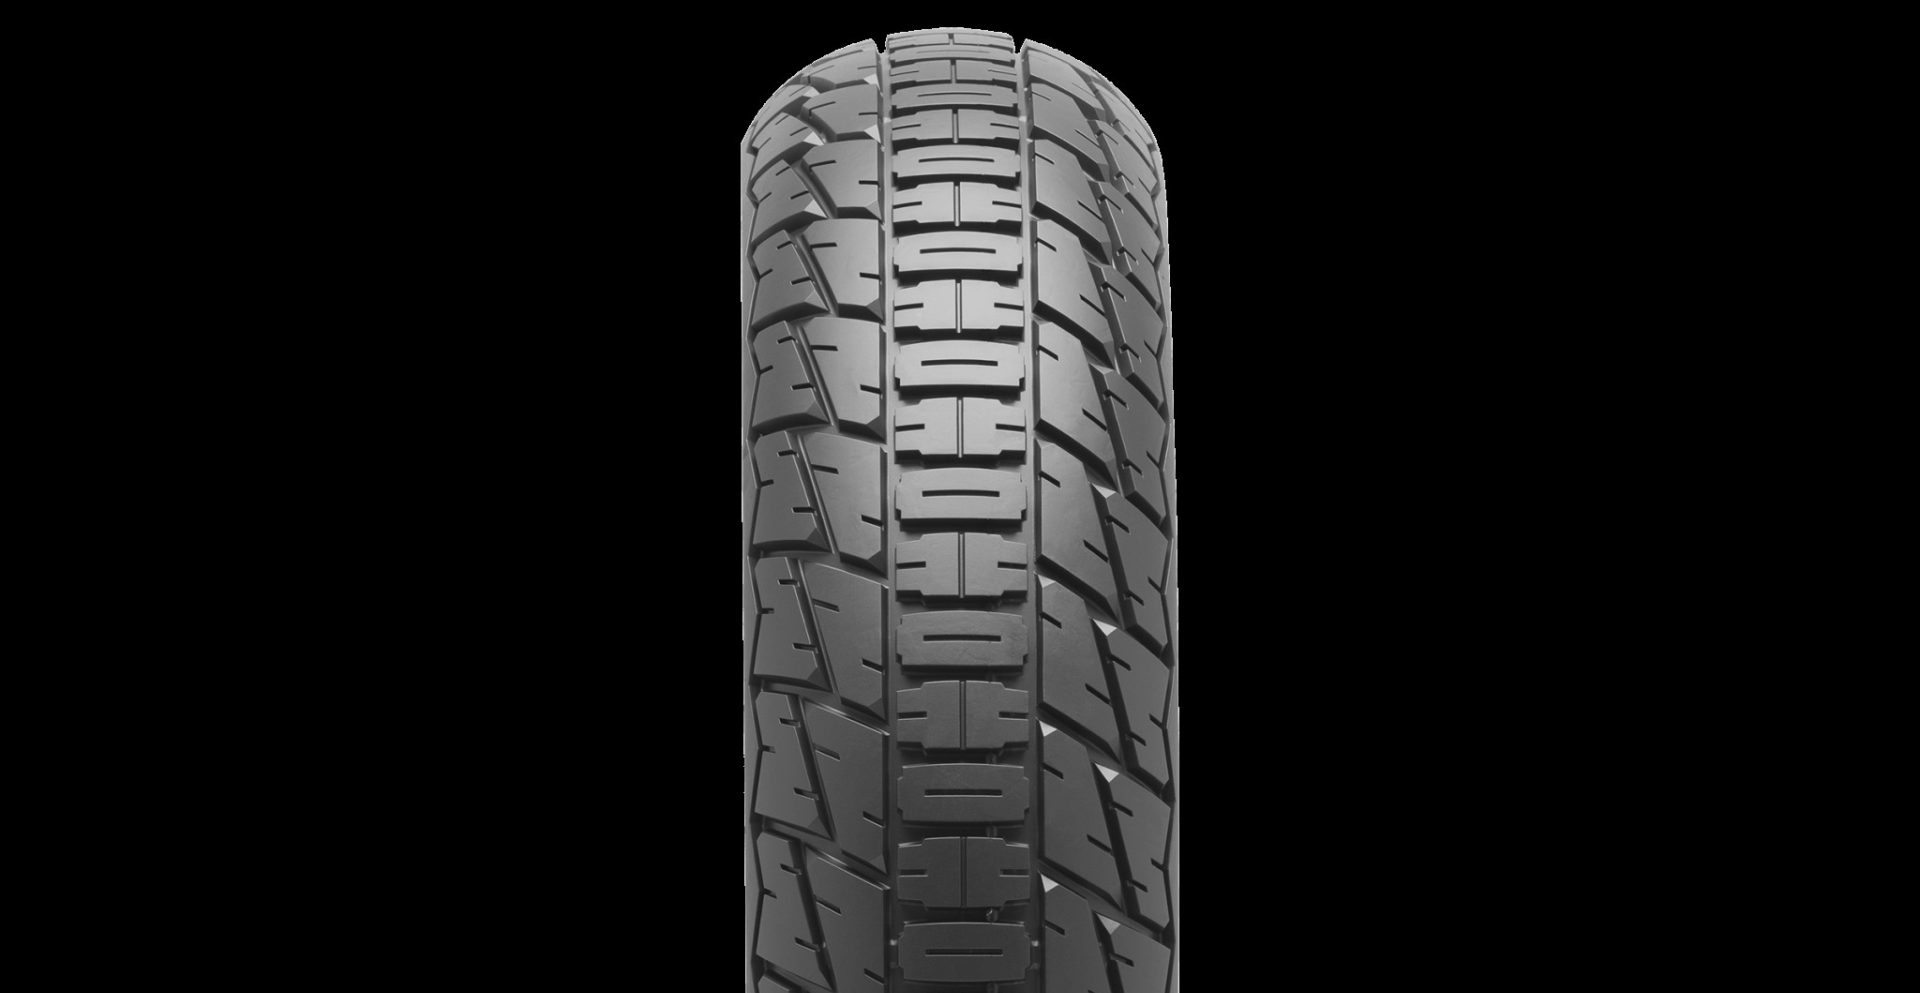 A Dunlop DT4 rear tire. Photo courtesy of Dunlop.